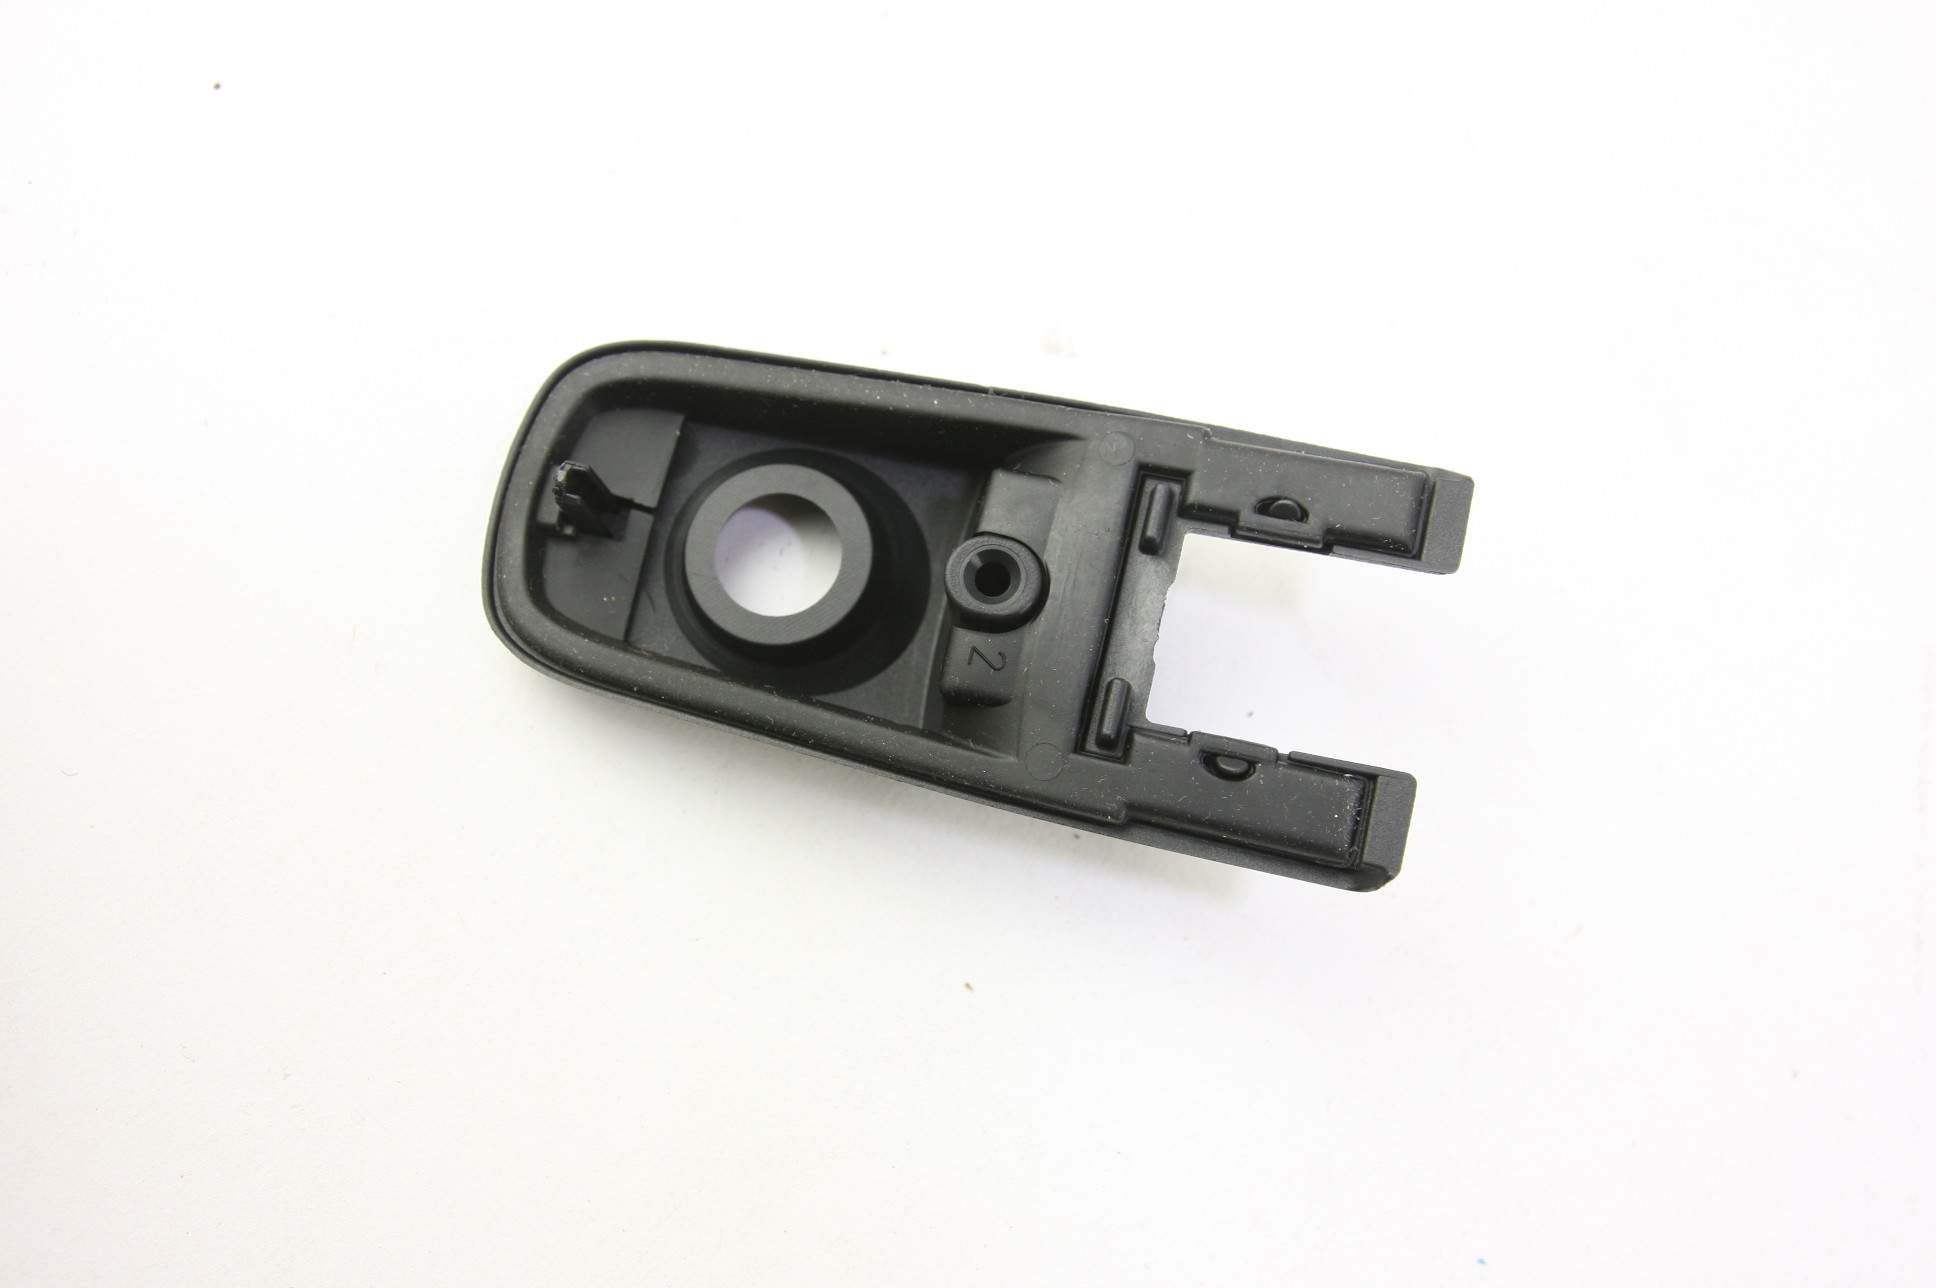 *~New OEM 8S4Z54218A14AA Ford 08-11 Focus Front Door Handle Outside Bezel Left - image 5